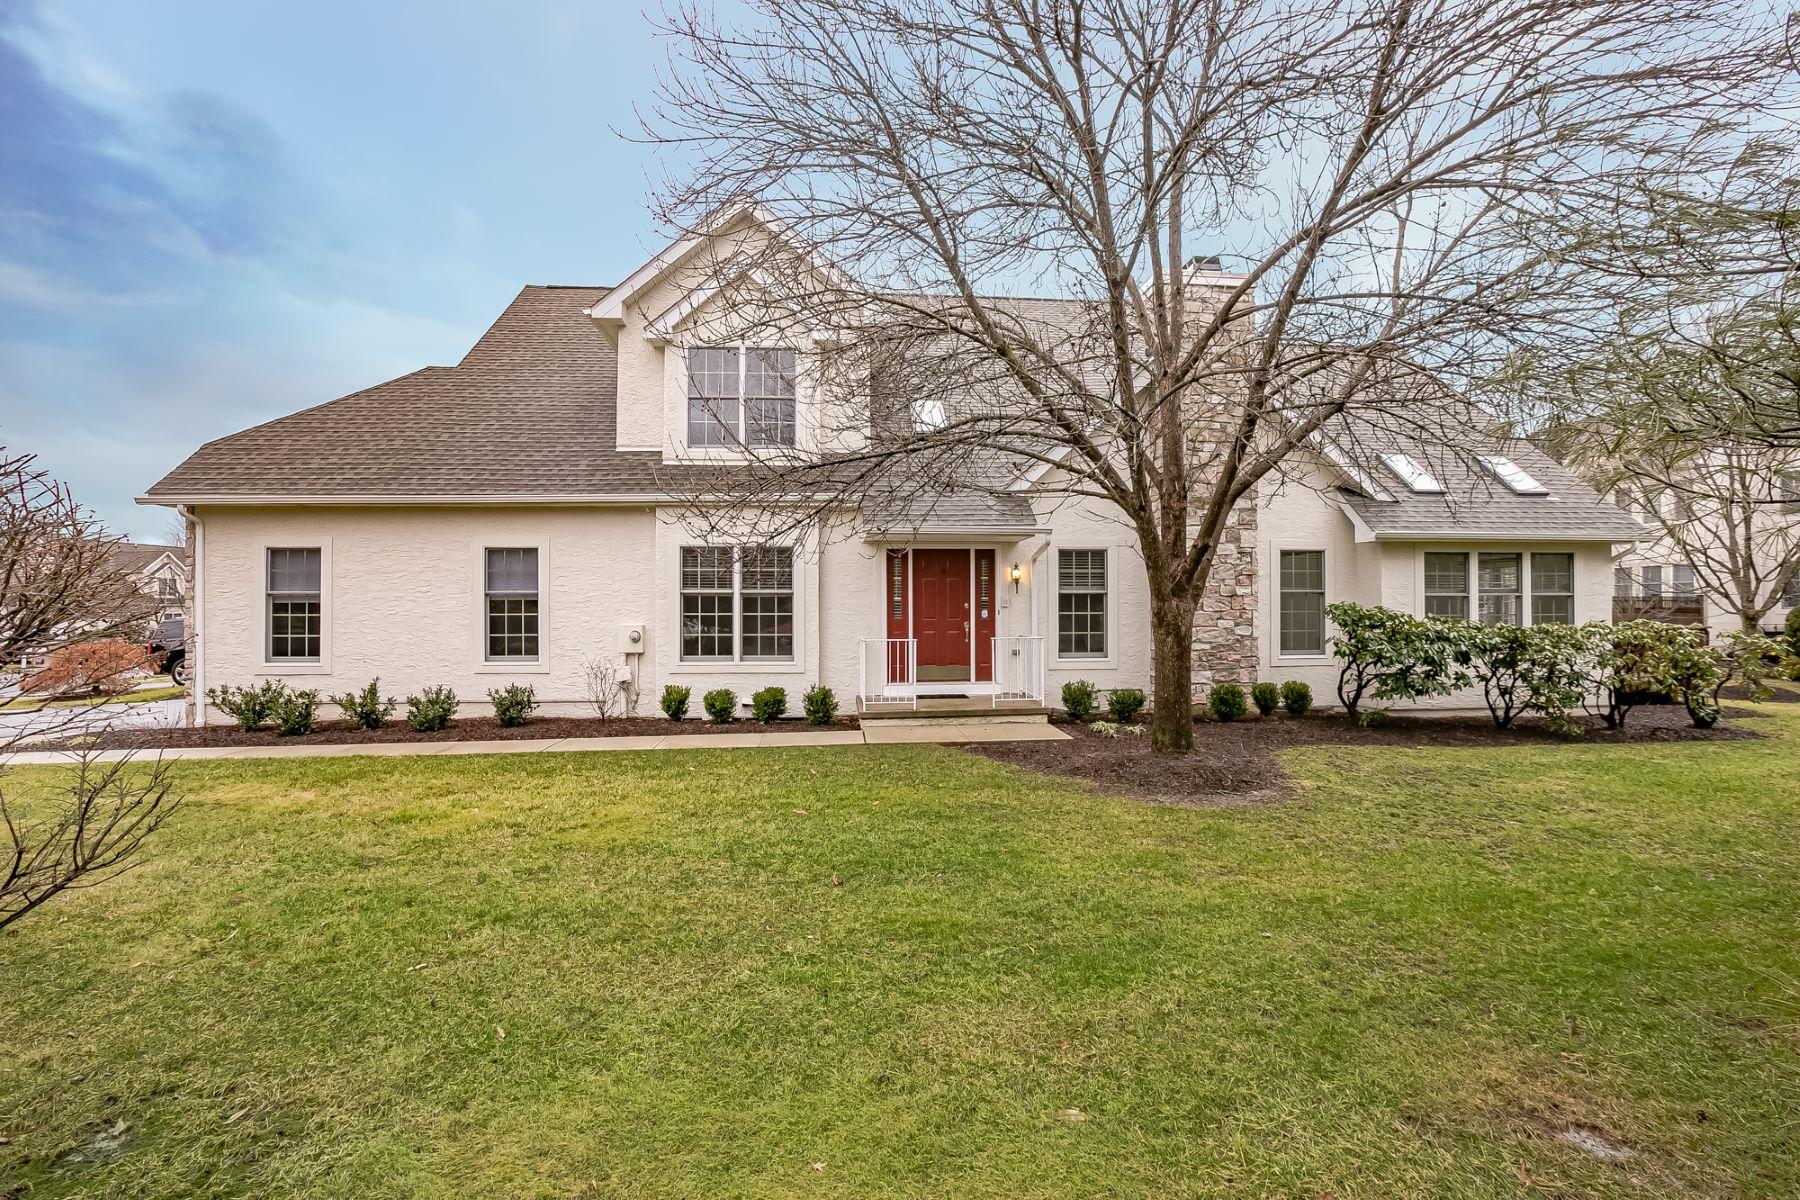 townhouses для того Продажа на Turn-key Townhouse 1 Richmond Drive, Basking Ridge, Нью-Джерси 07920 Соединенные Штаты